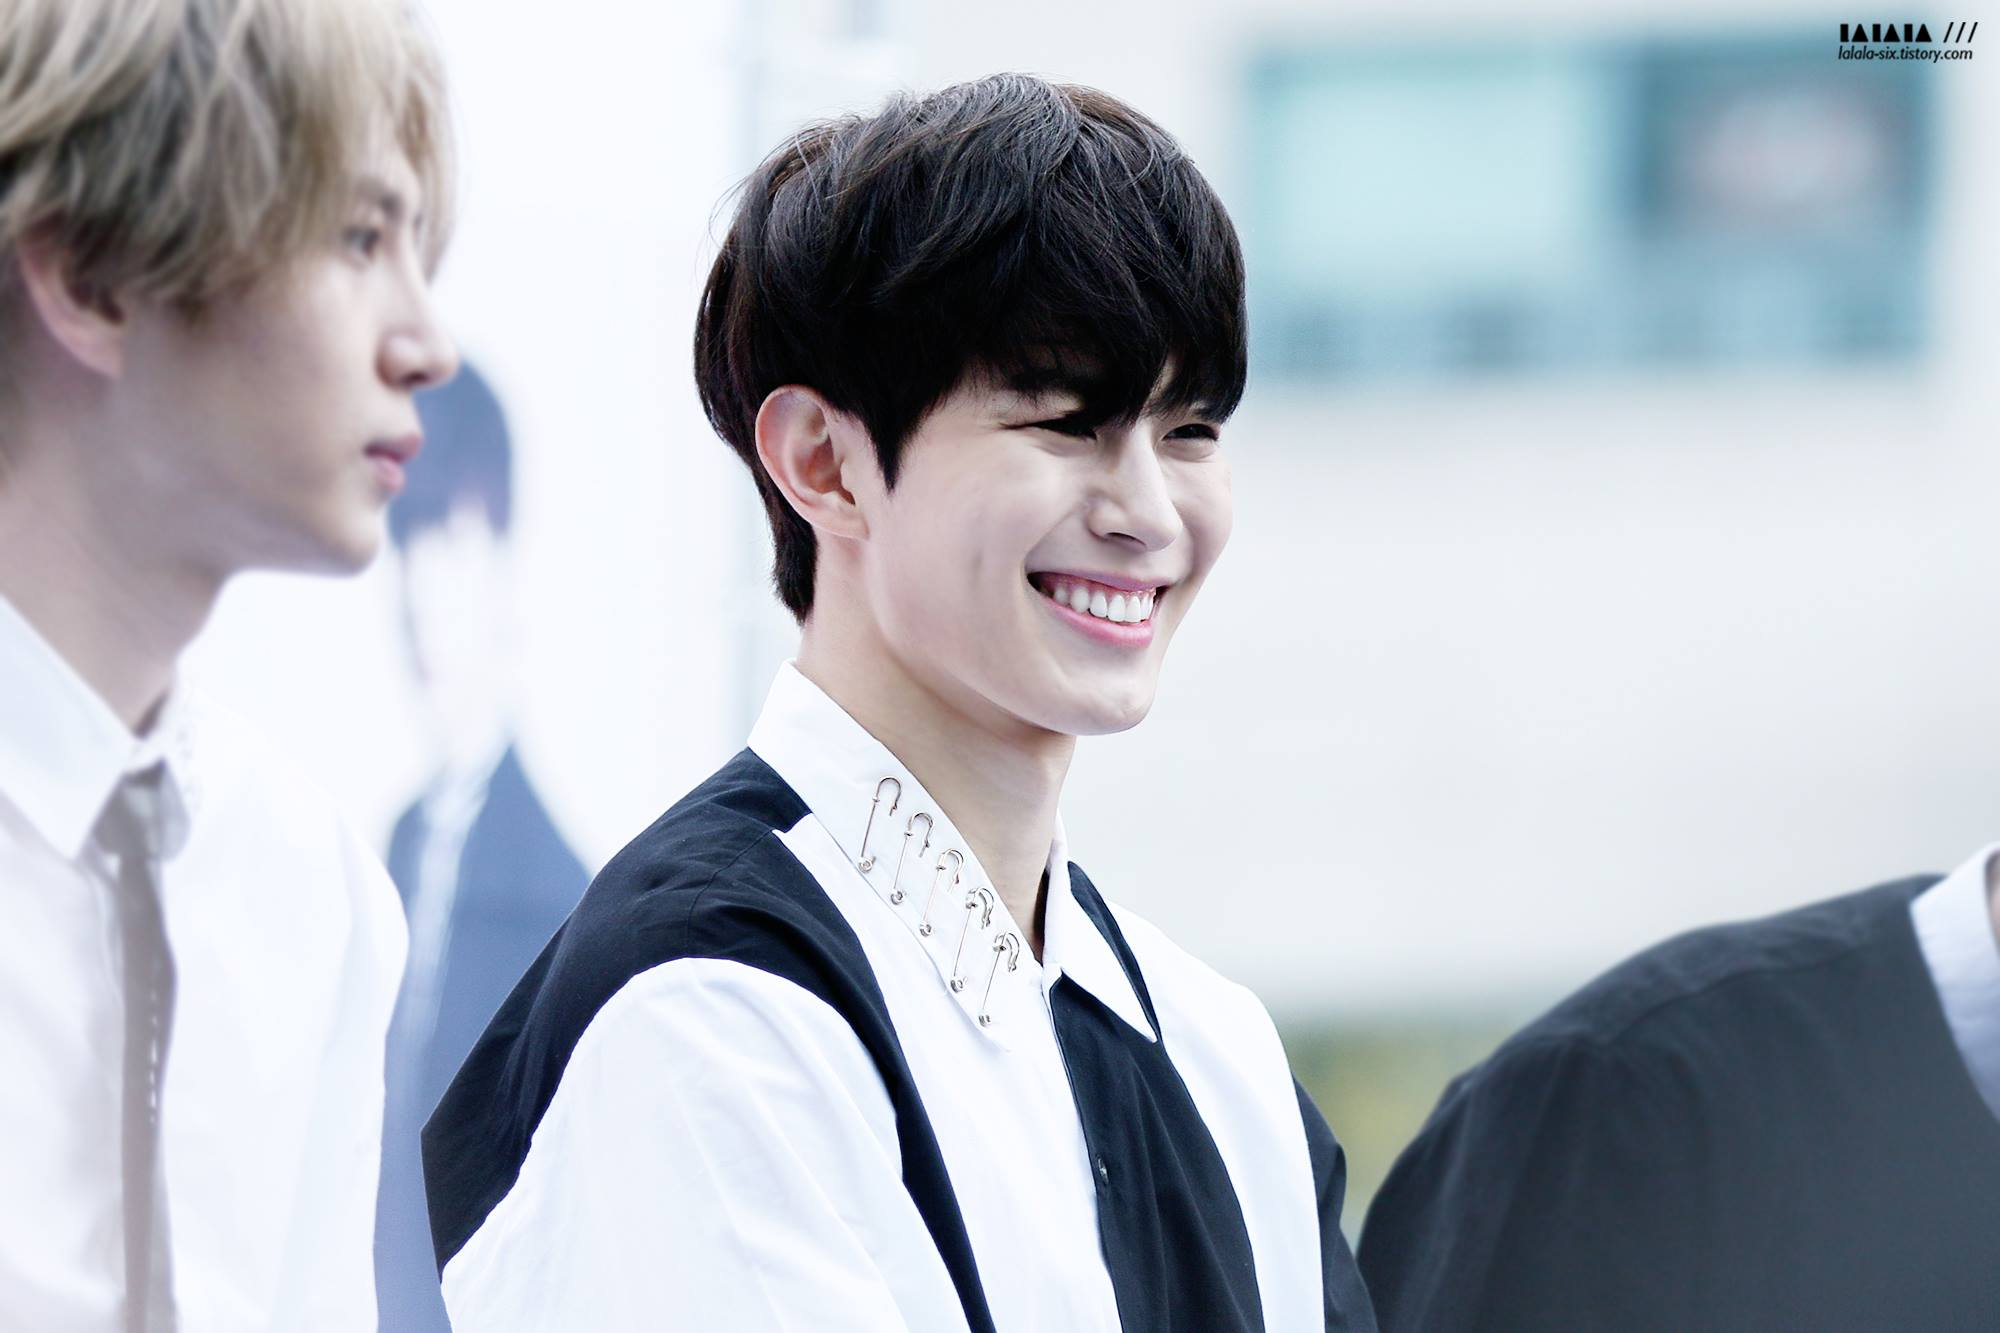 ♥ VIXX 弘彬  ST★RLIGHT(VIXX 粉絲名)眼中的豆豆小王子,笑容很溫暖的他,總給人好好先生的形象。